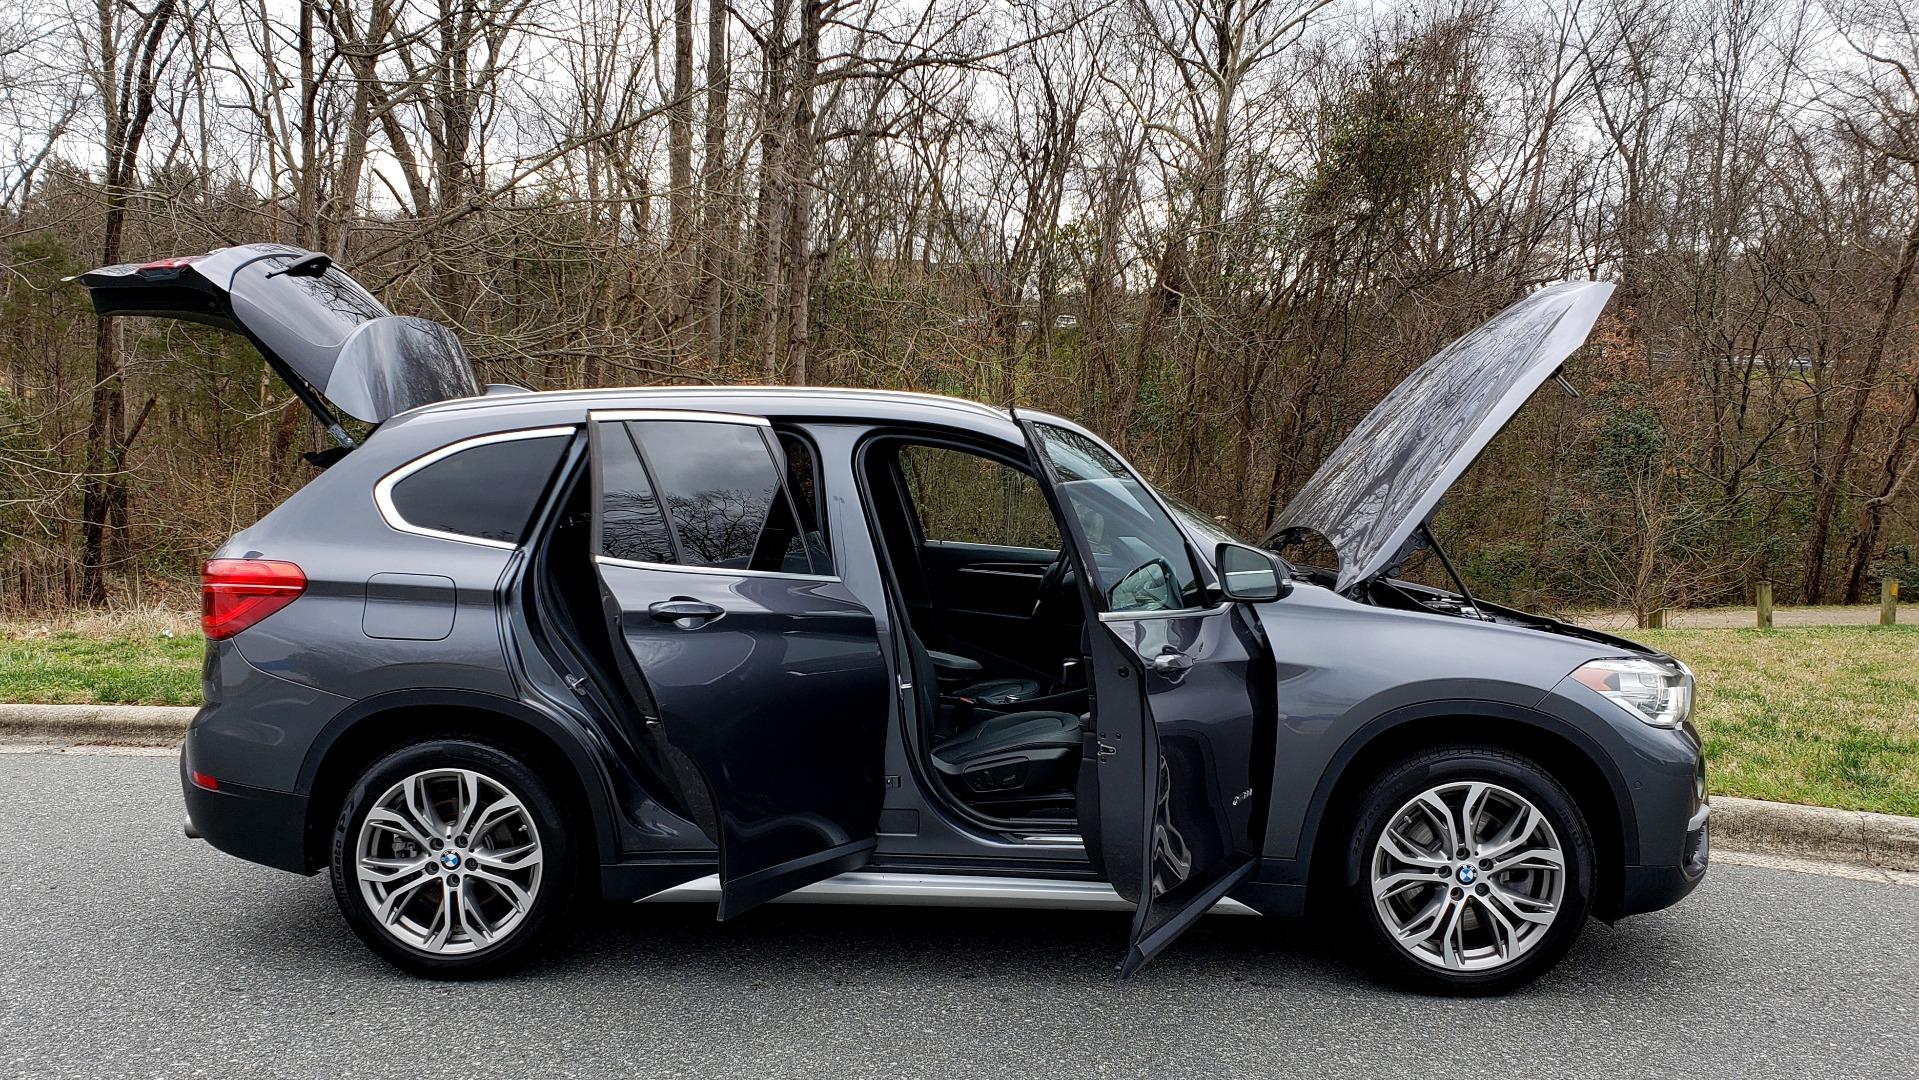 Used 2017 BMW X1 XDRIVE28I / PREM PKG / DRIVER ASST / NAV / CLD WTHR for sale Sold at Formula Imports in Charlotte NC 28227 10